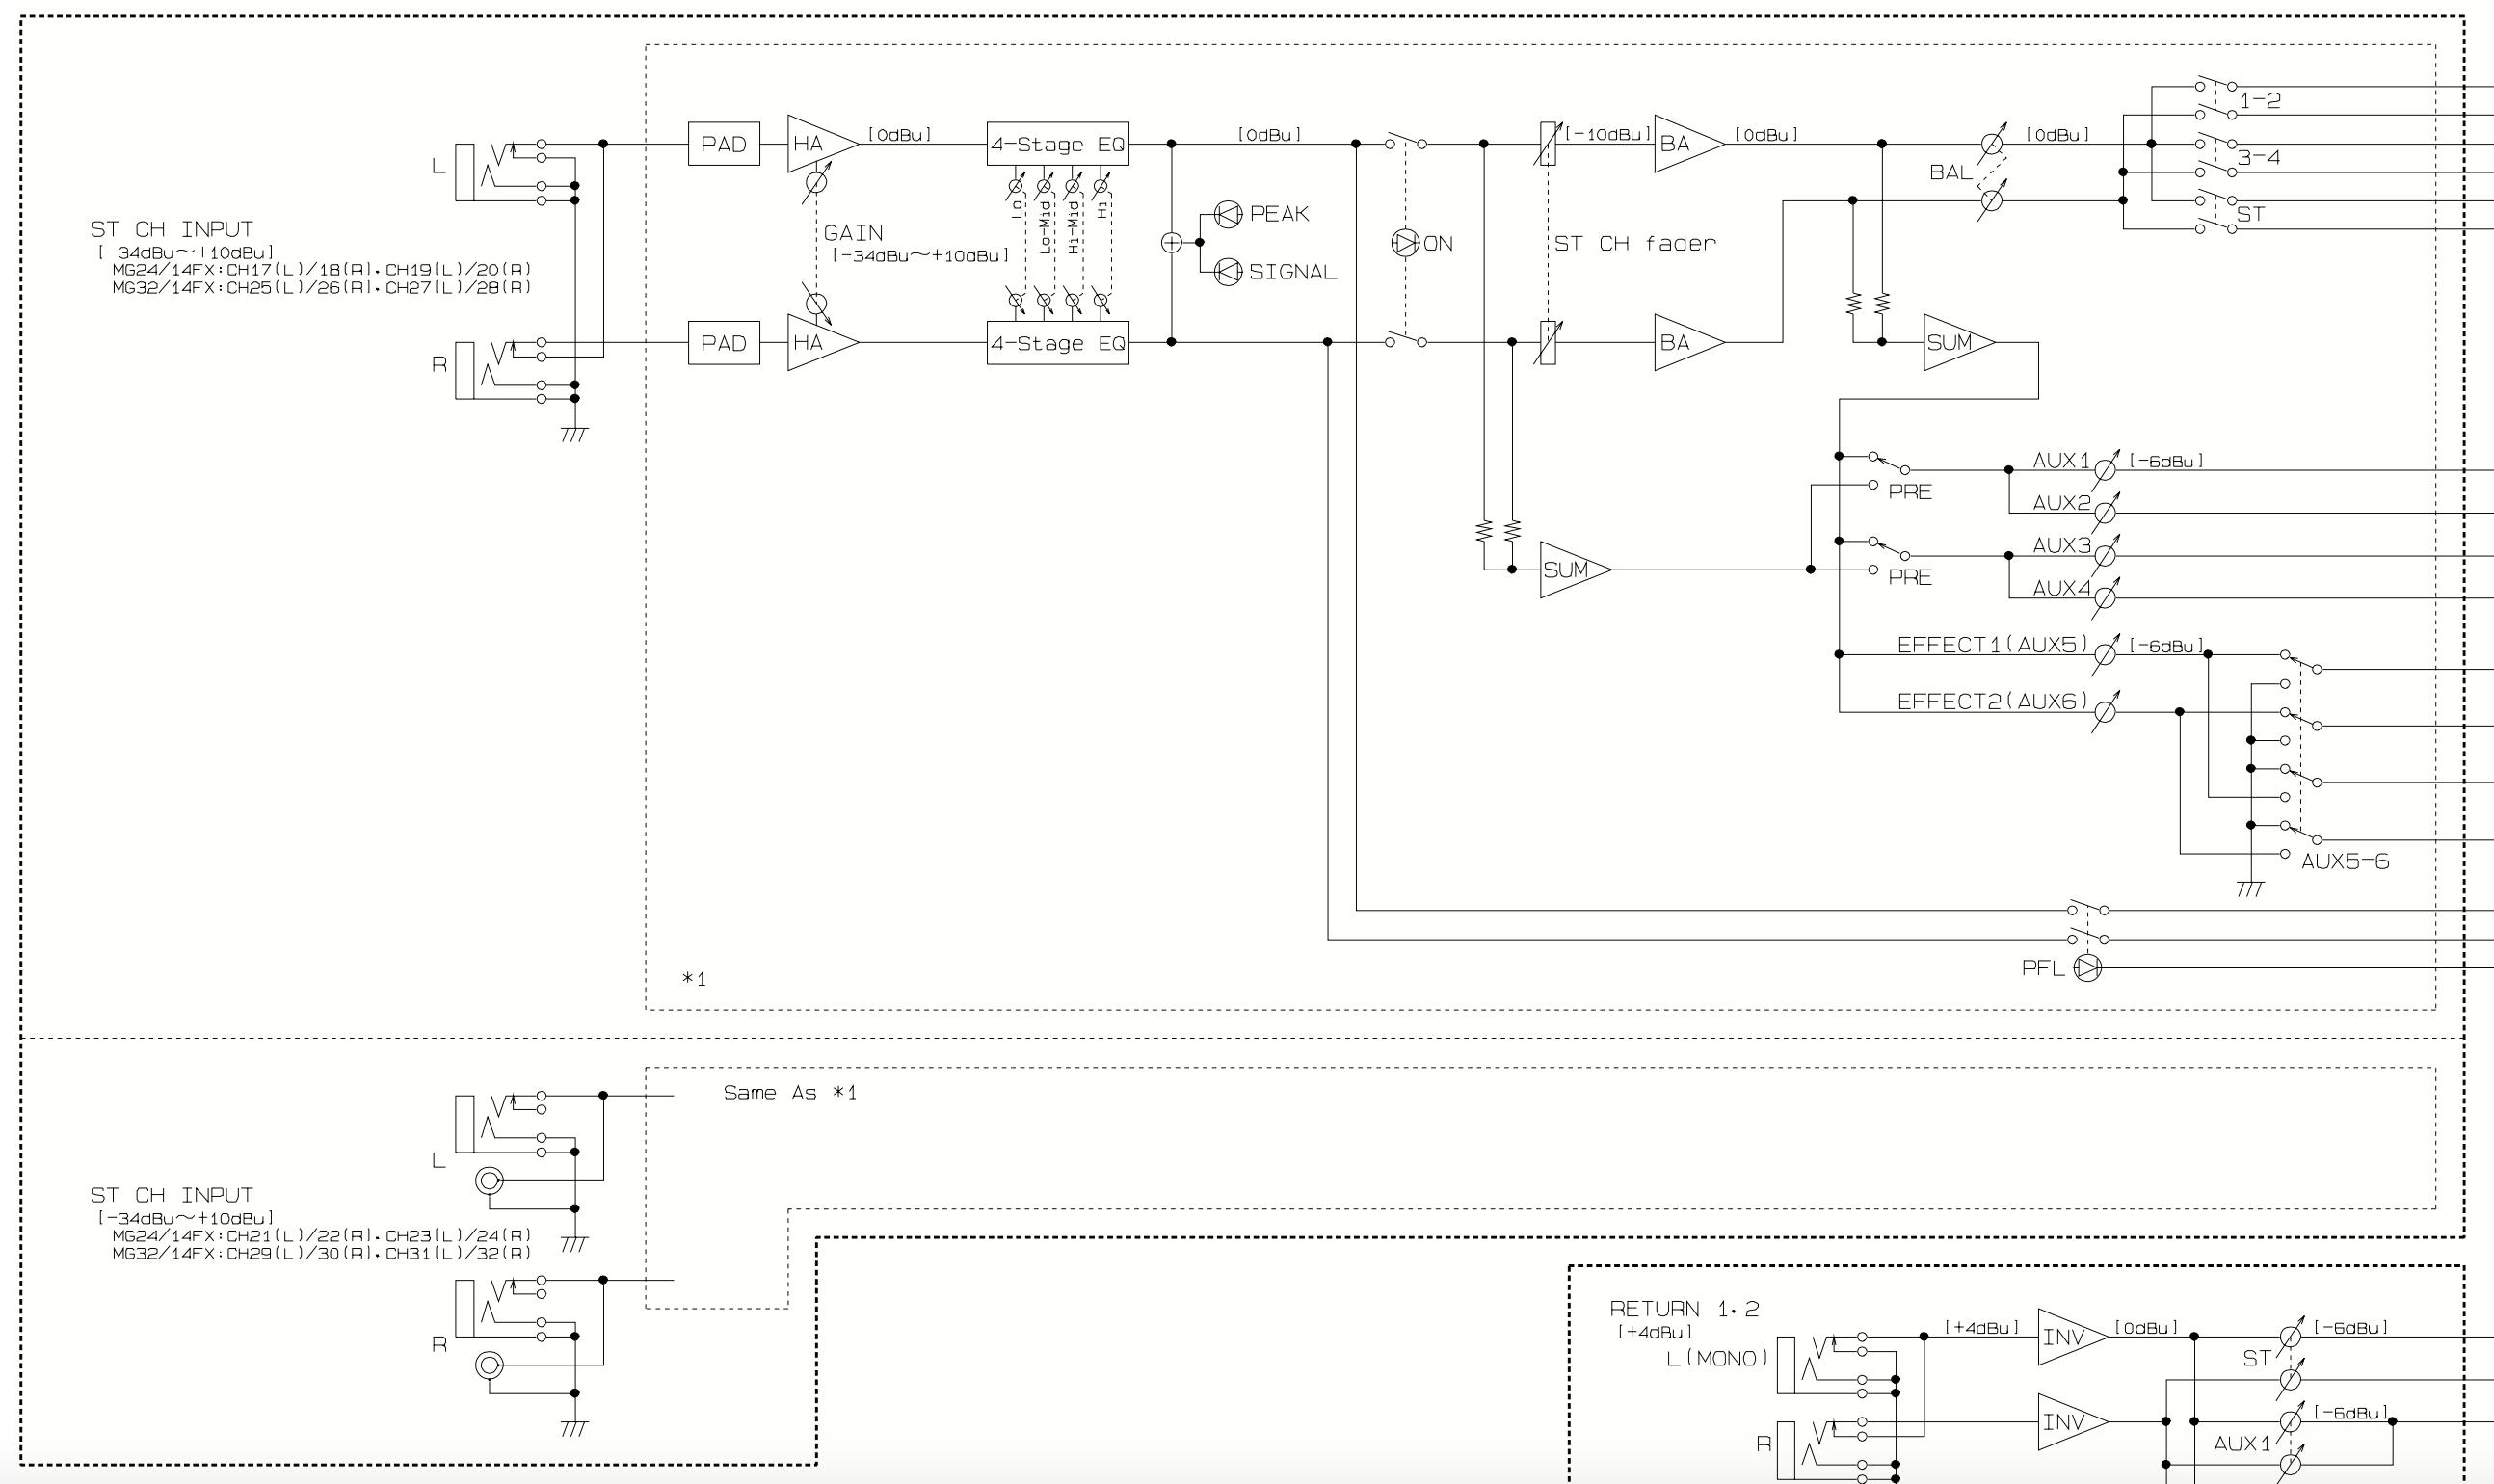 Wiring Diagram For Oshkosh Mixer Audio Connector Diagrams Auto Xlr Mic Cable 43467d1193287700